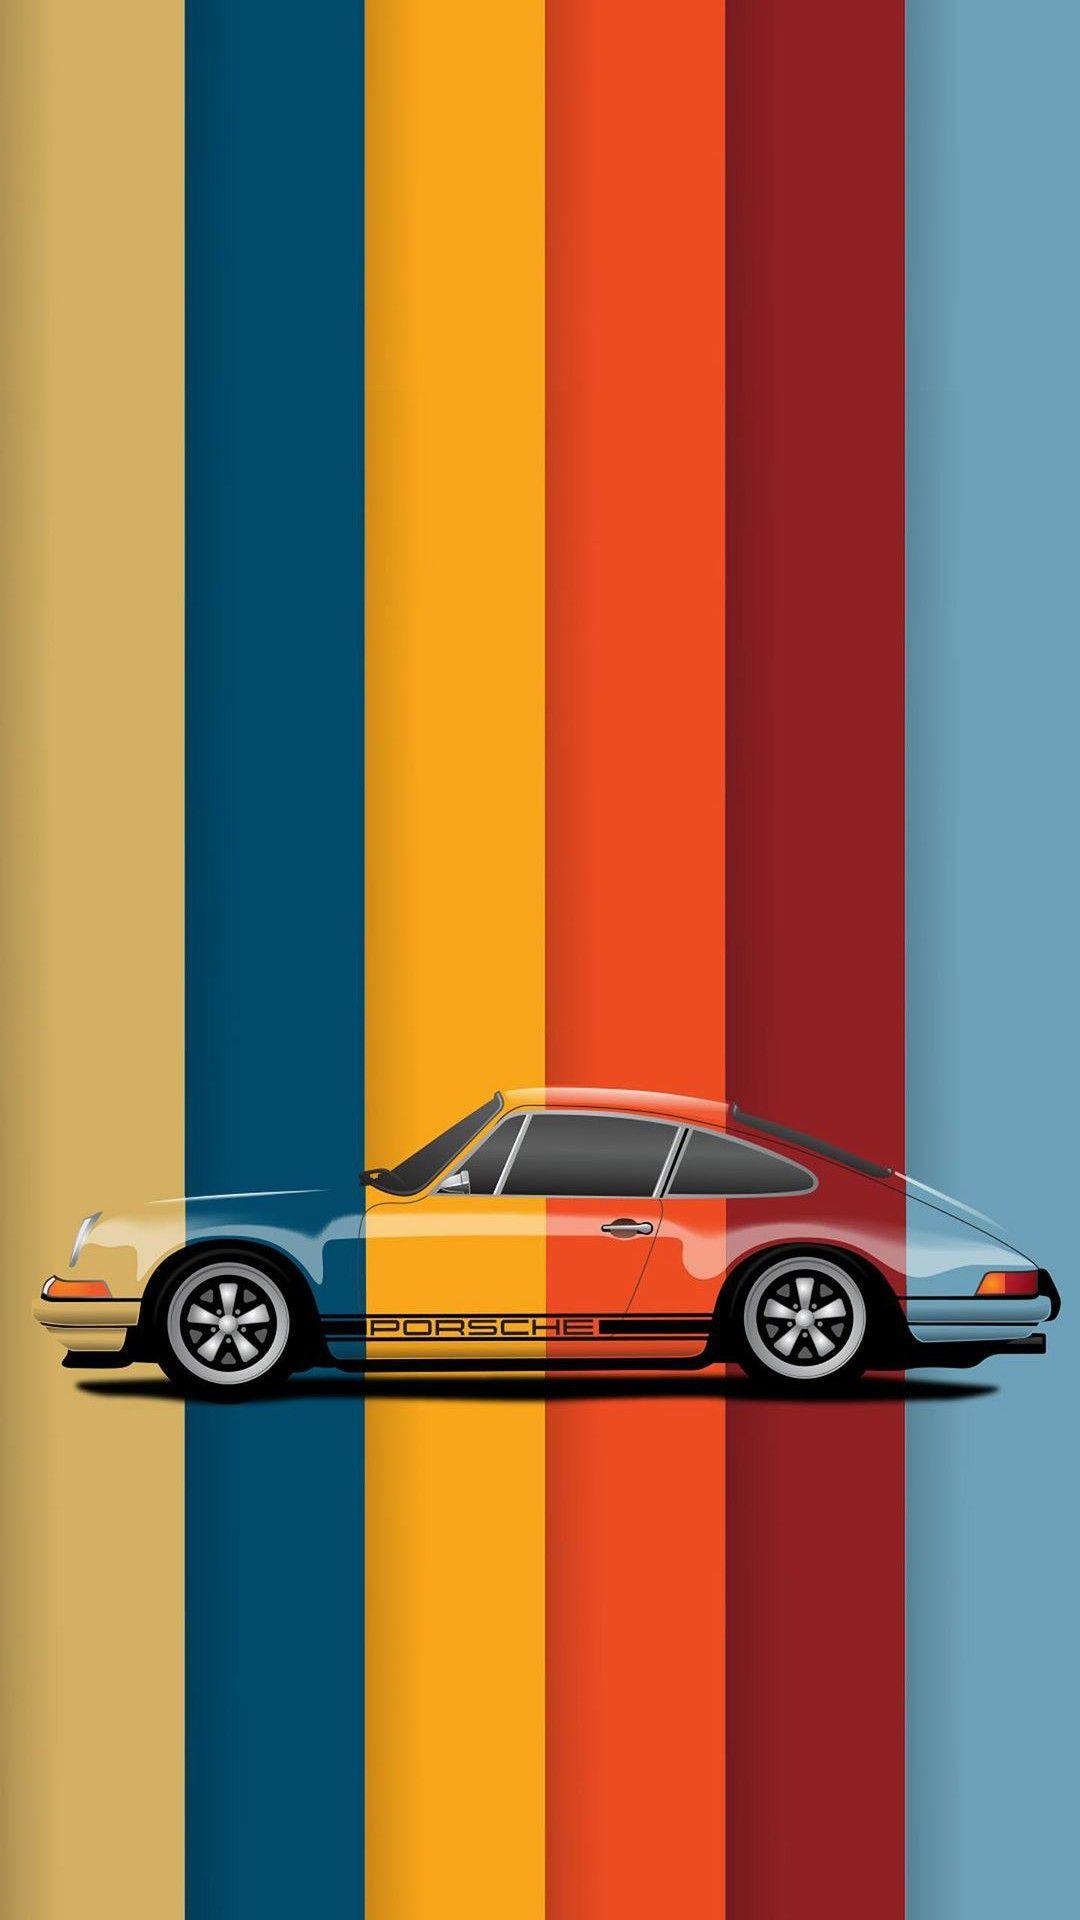 Porsche Minimal Wallpaper 1080x1920 Oneplus Wallpapers Xperia Wallpaper Samsung Galaxy Wallpaper